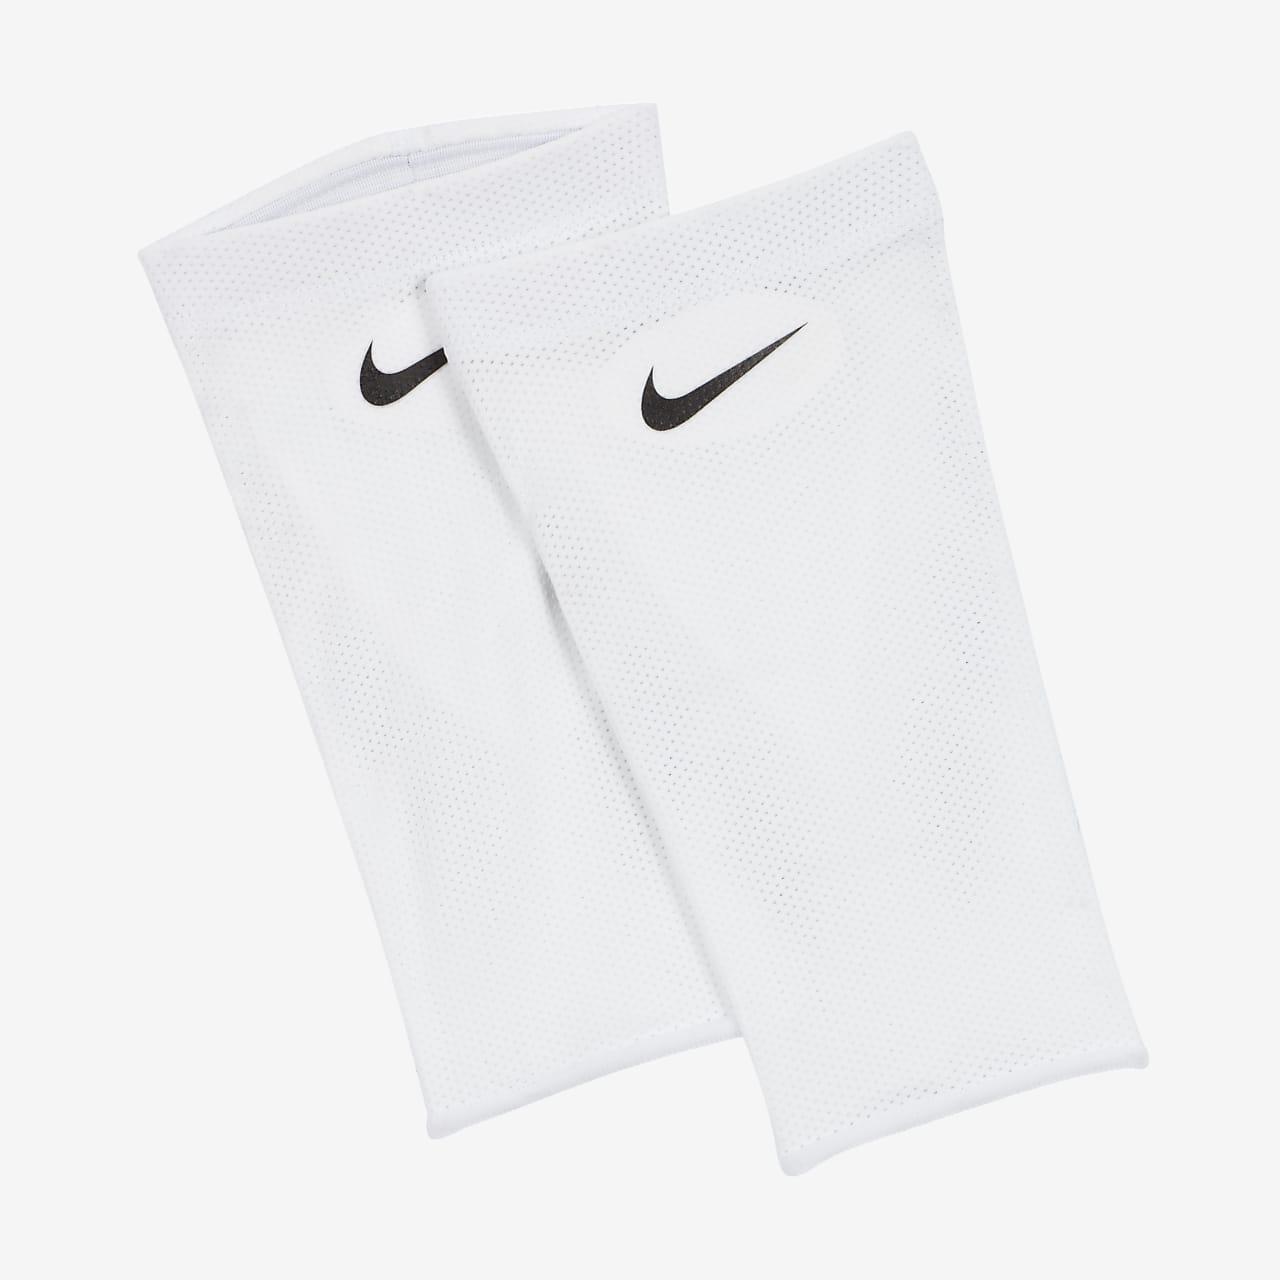 Nike Guard Lock Elite Football Guard Sleeves (1 Pair)